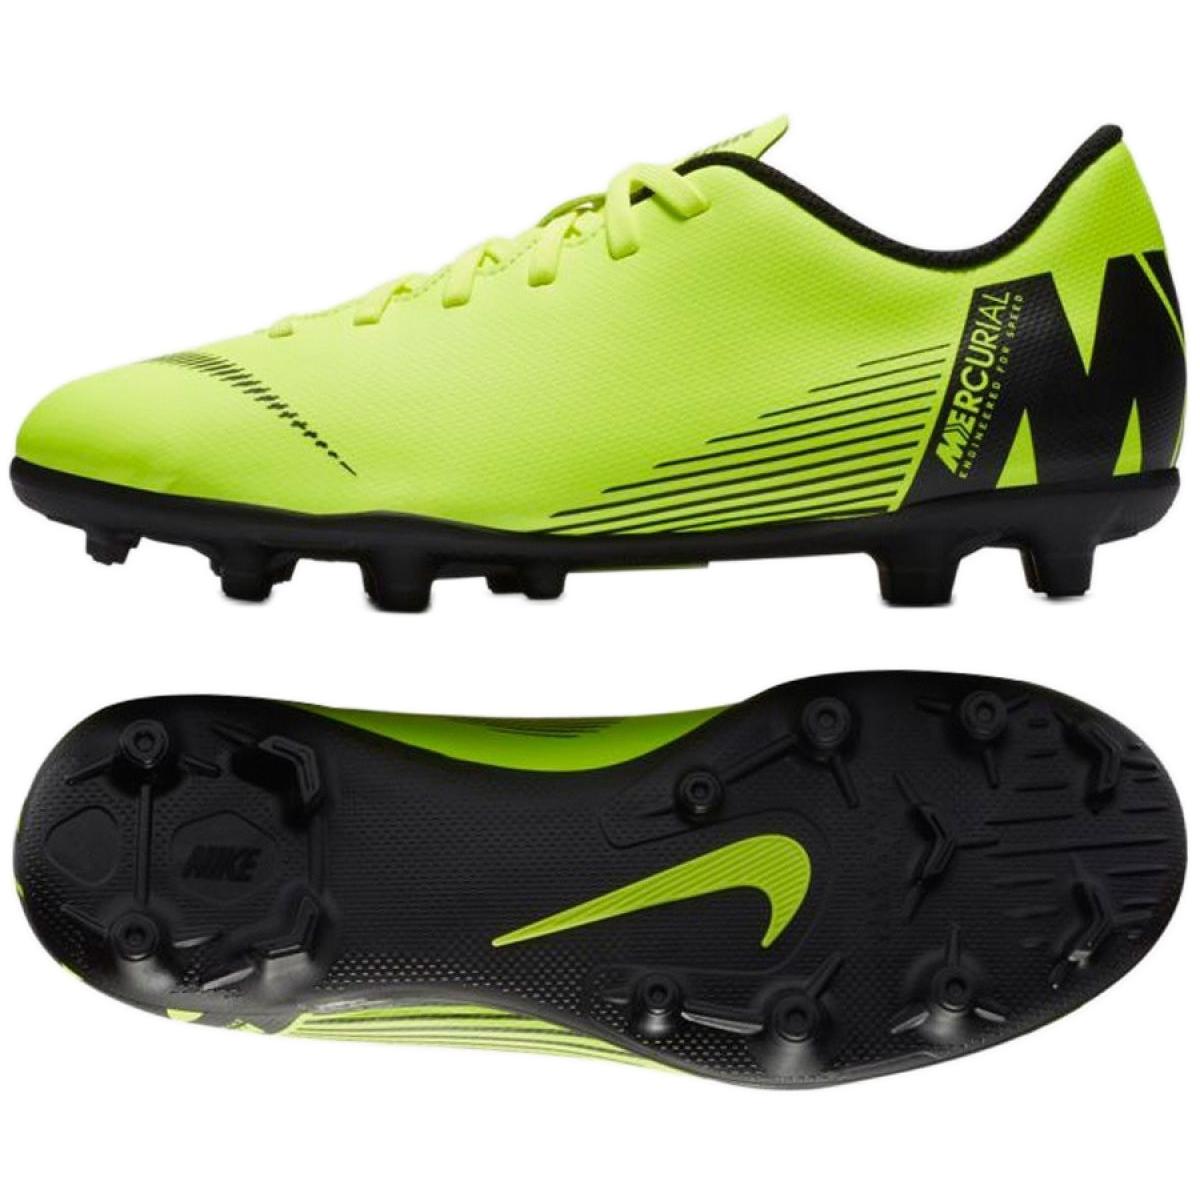 Nike Mercurial Vapor 12 Club Mg Jr AH7350 701 futballcipő zöld zöld